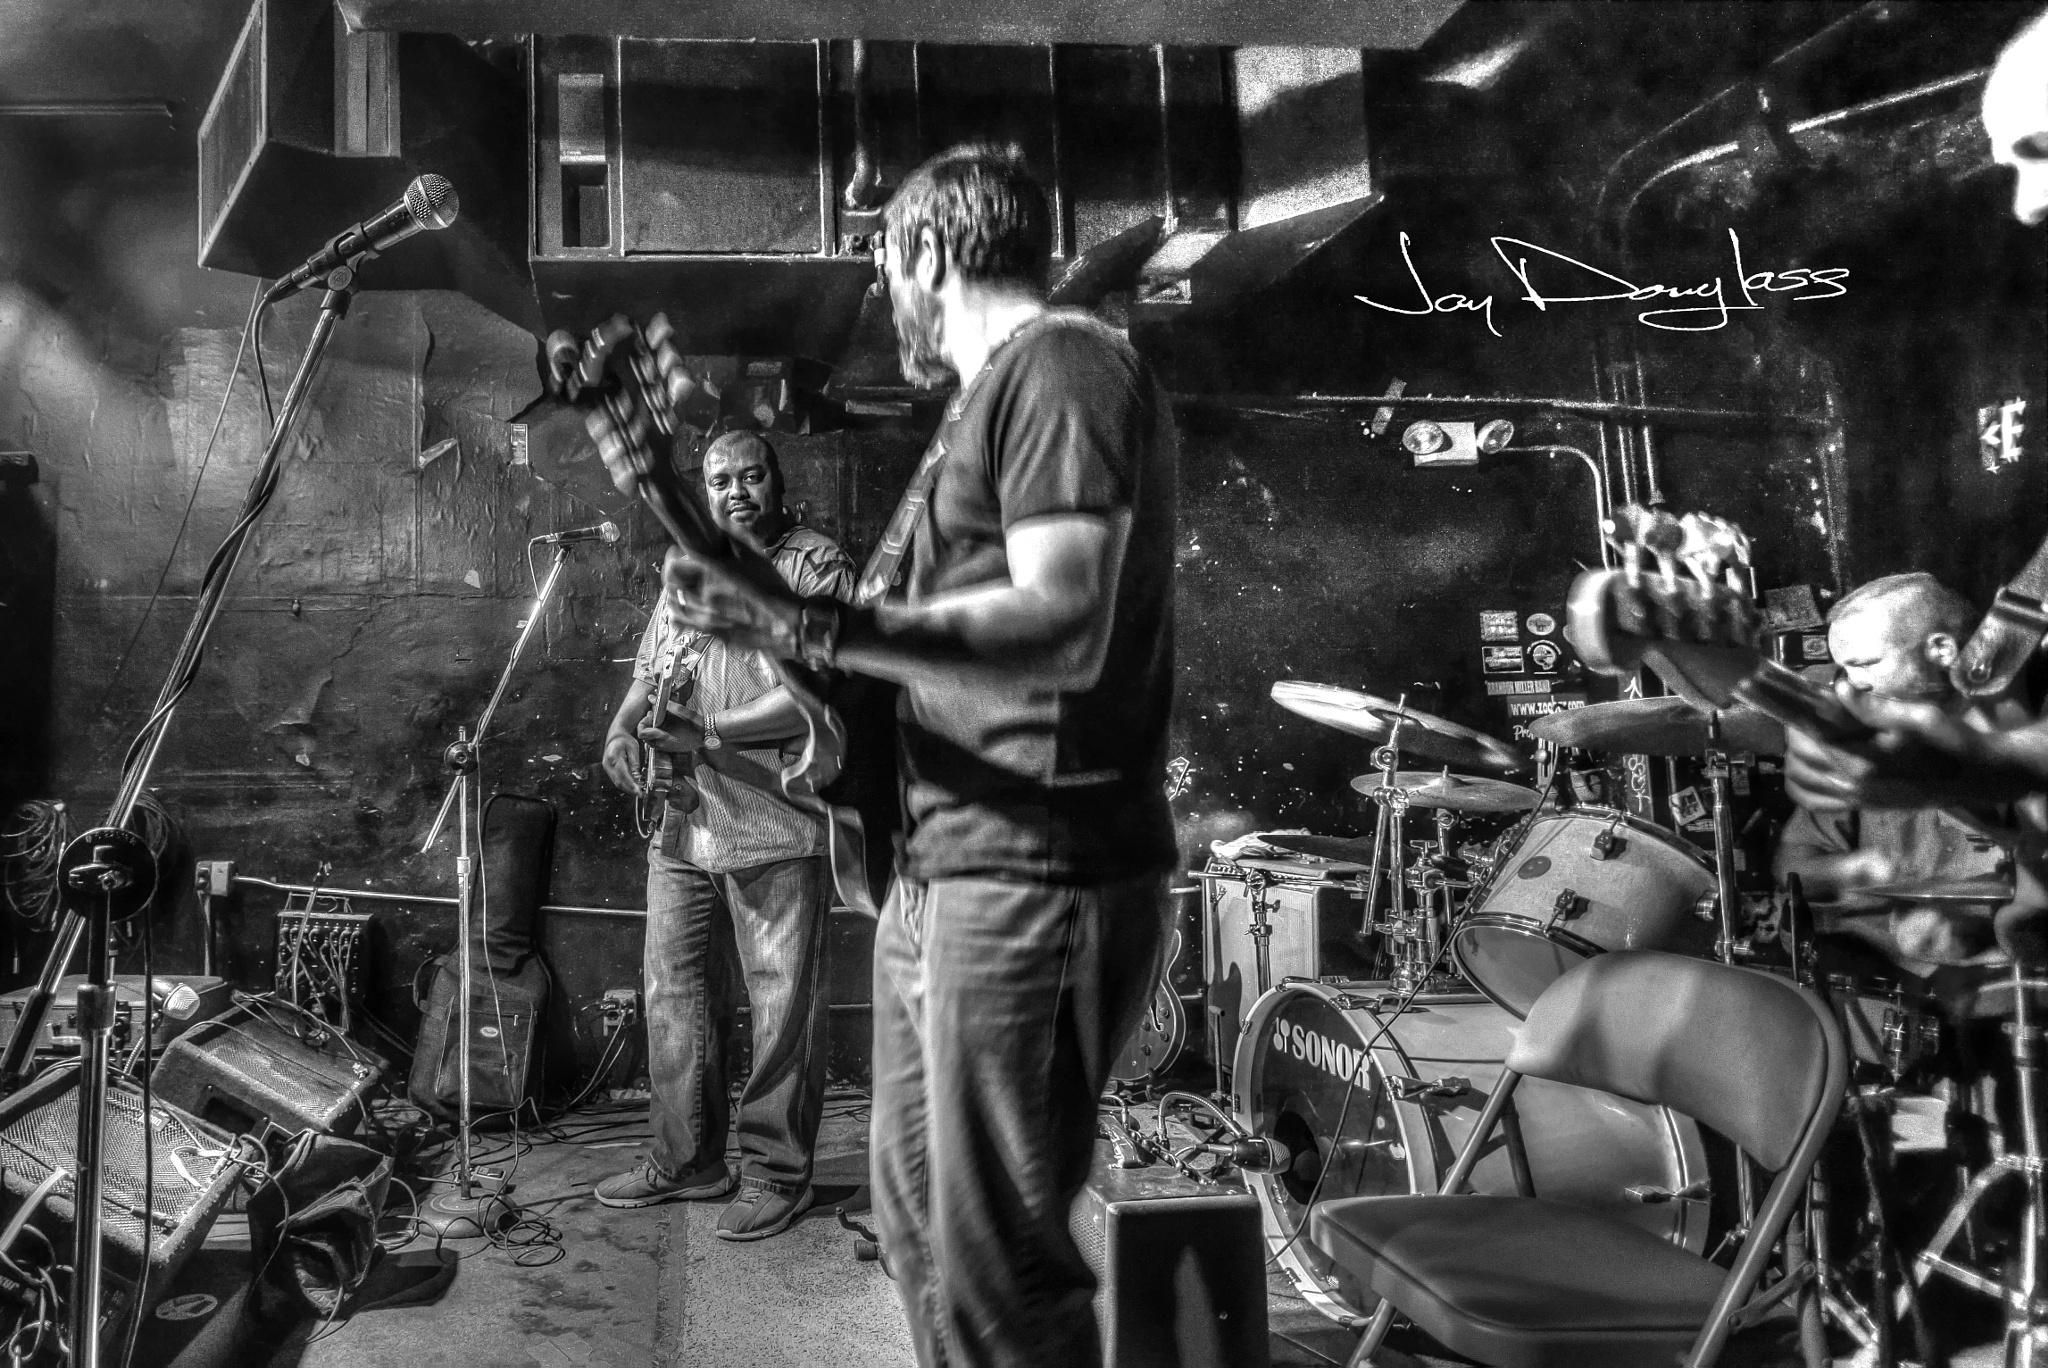 Lil Slim Blues Band by Jay Douglass